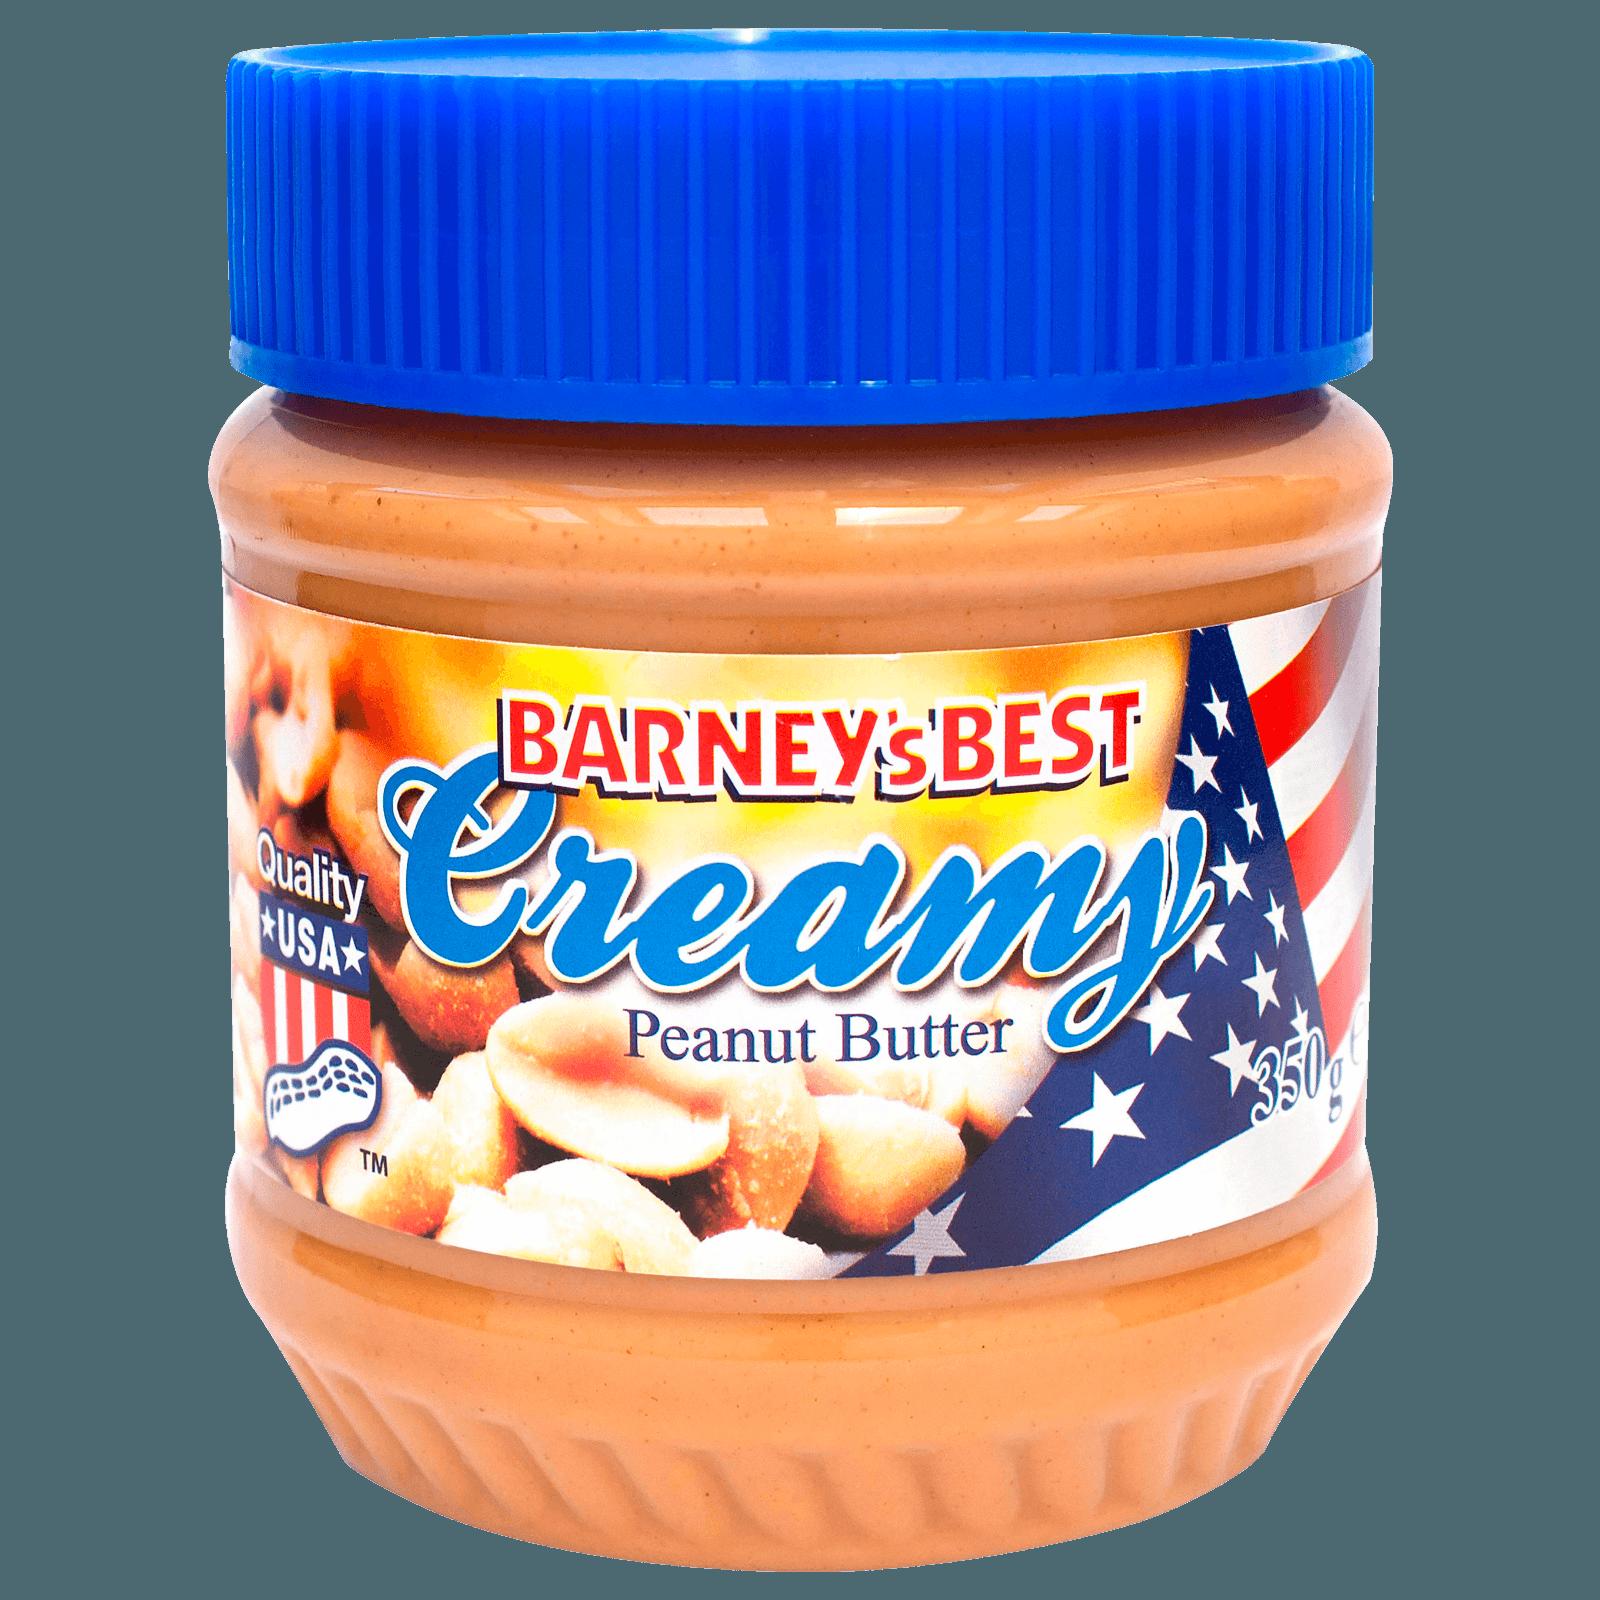 Barney\'s Best Peanut Butter creamy 350g bei REWE online bestellen!